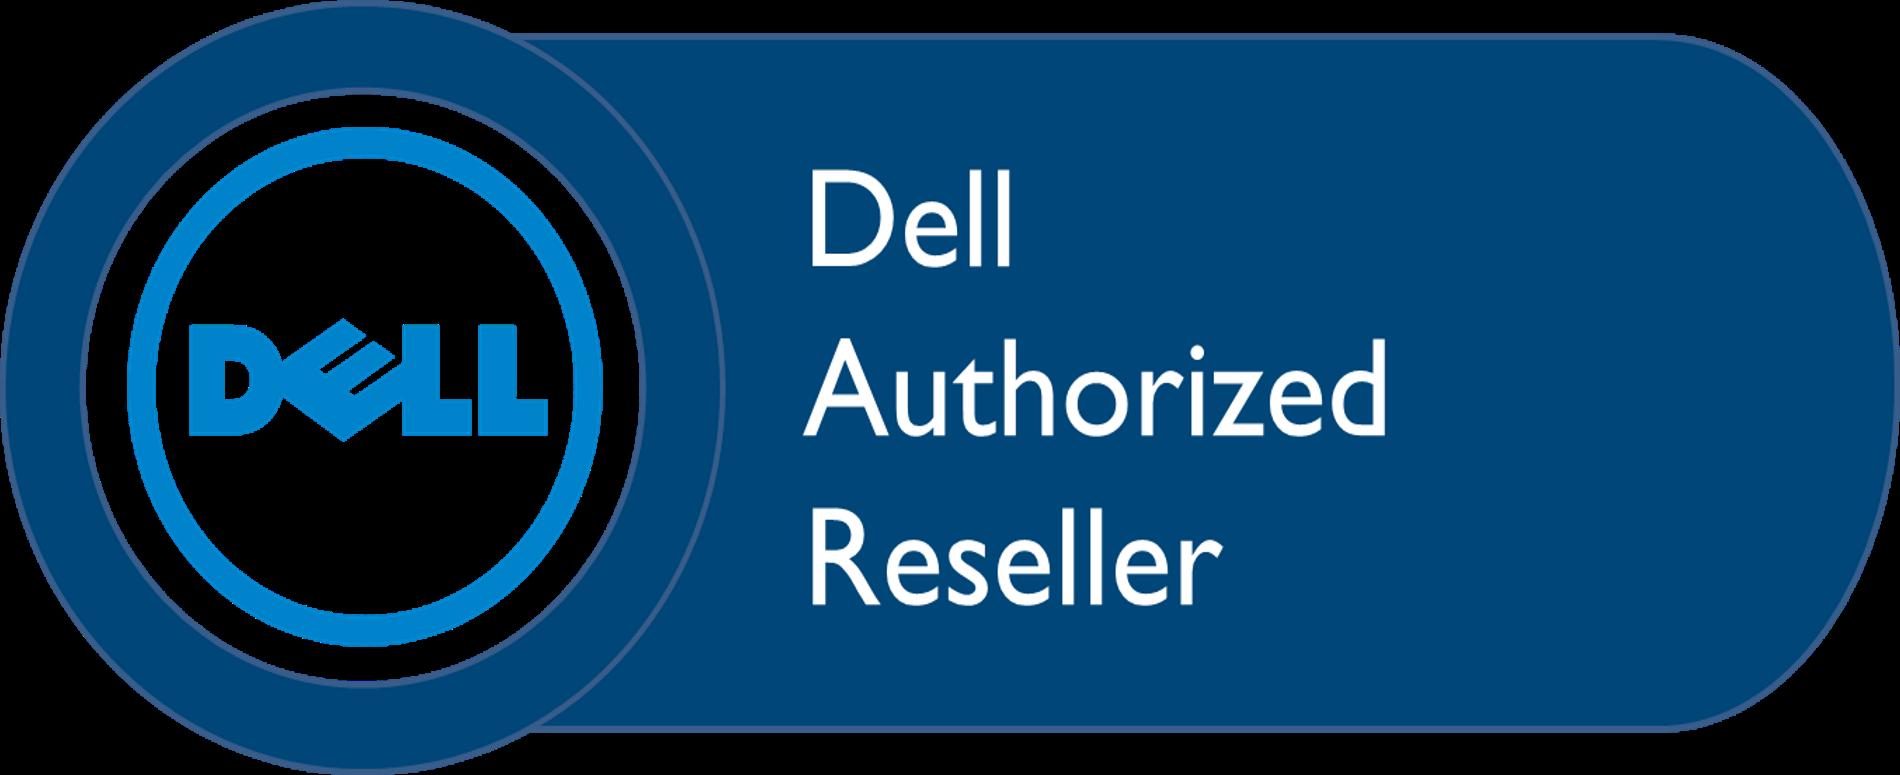 Авторизованный реселлер Dell